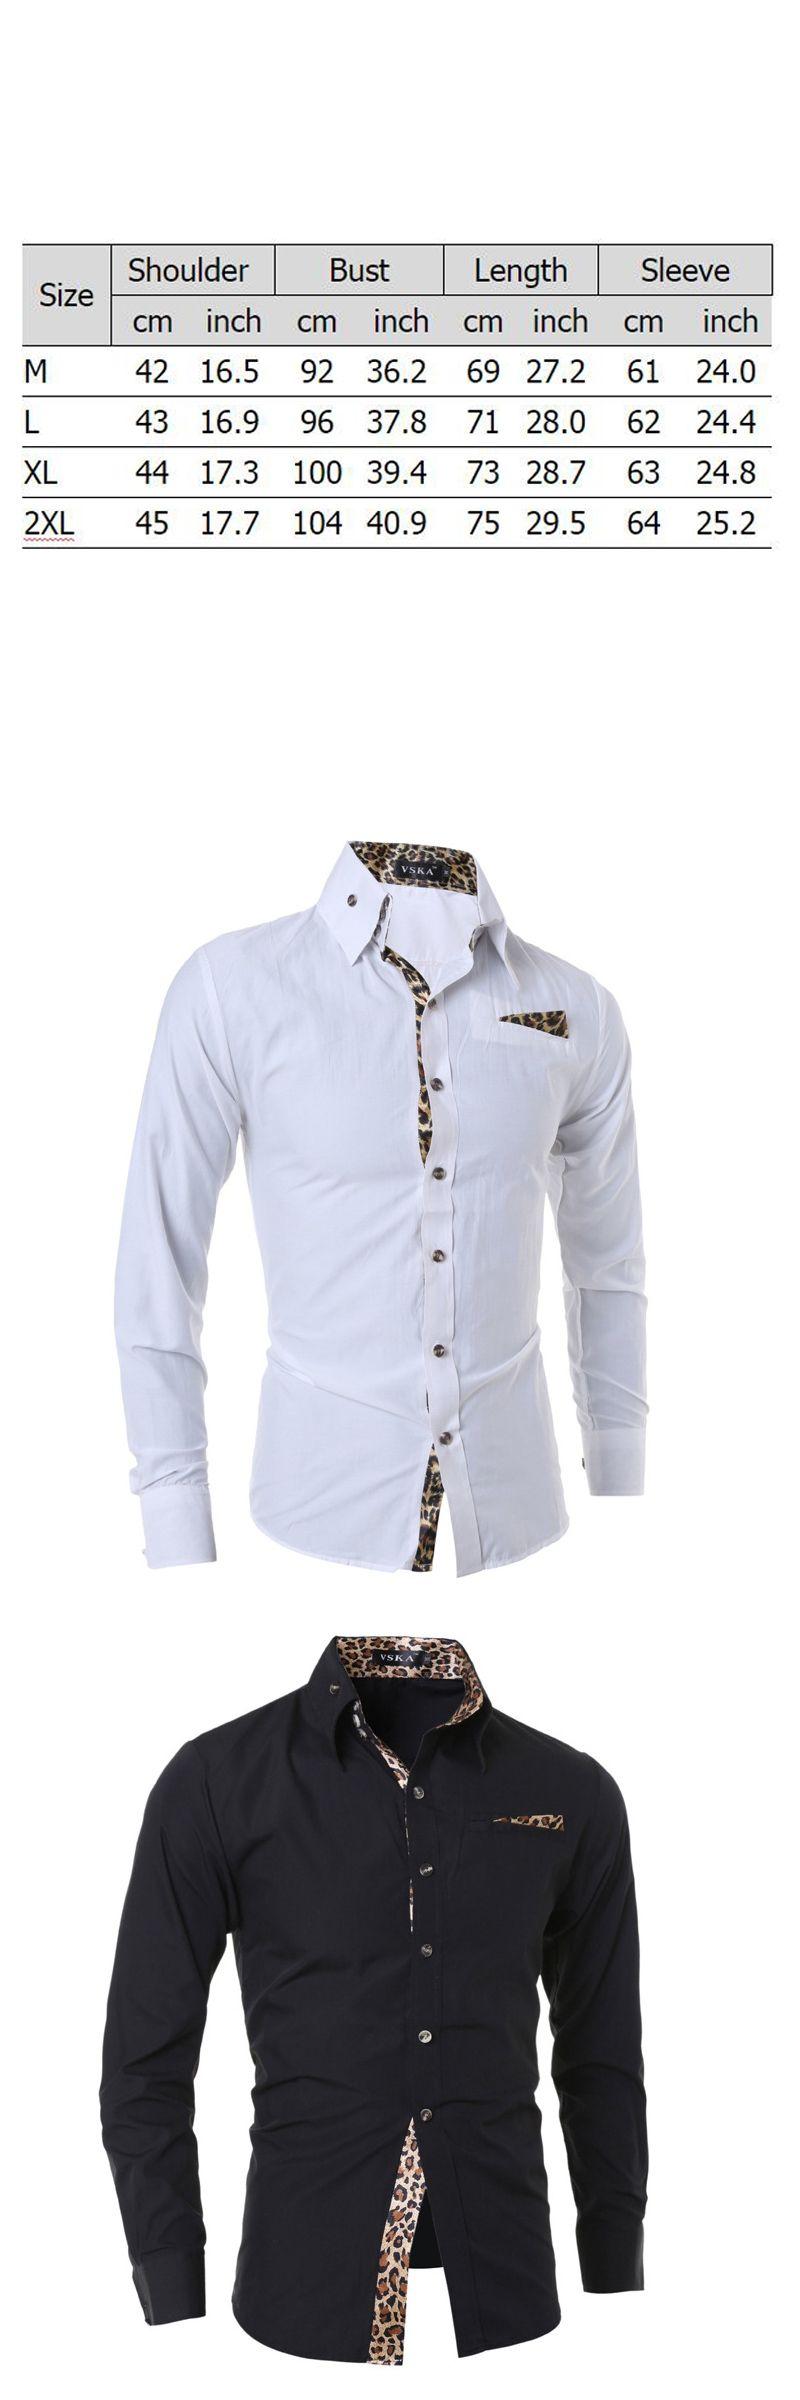 2f654c6e0bd Leopard Print Men s Long Sleeve Shirt Cotton Causal Classic Stand Collar  Slim Brand High Quality Camisa